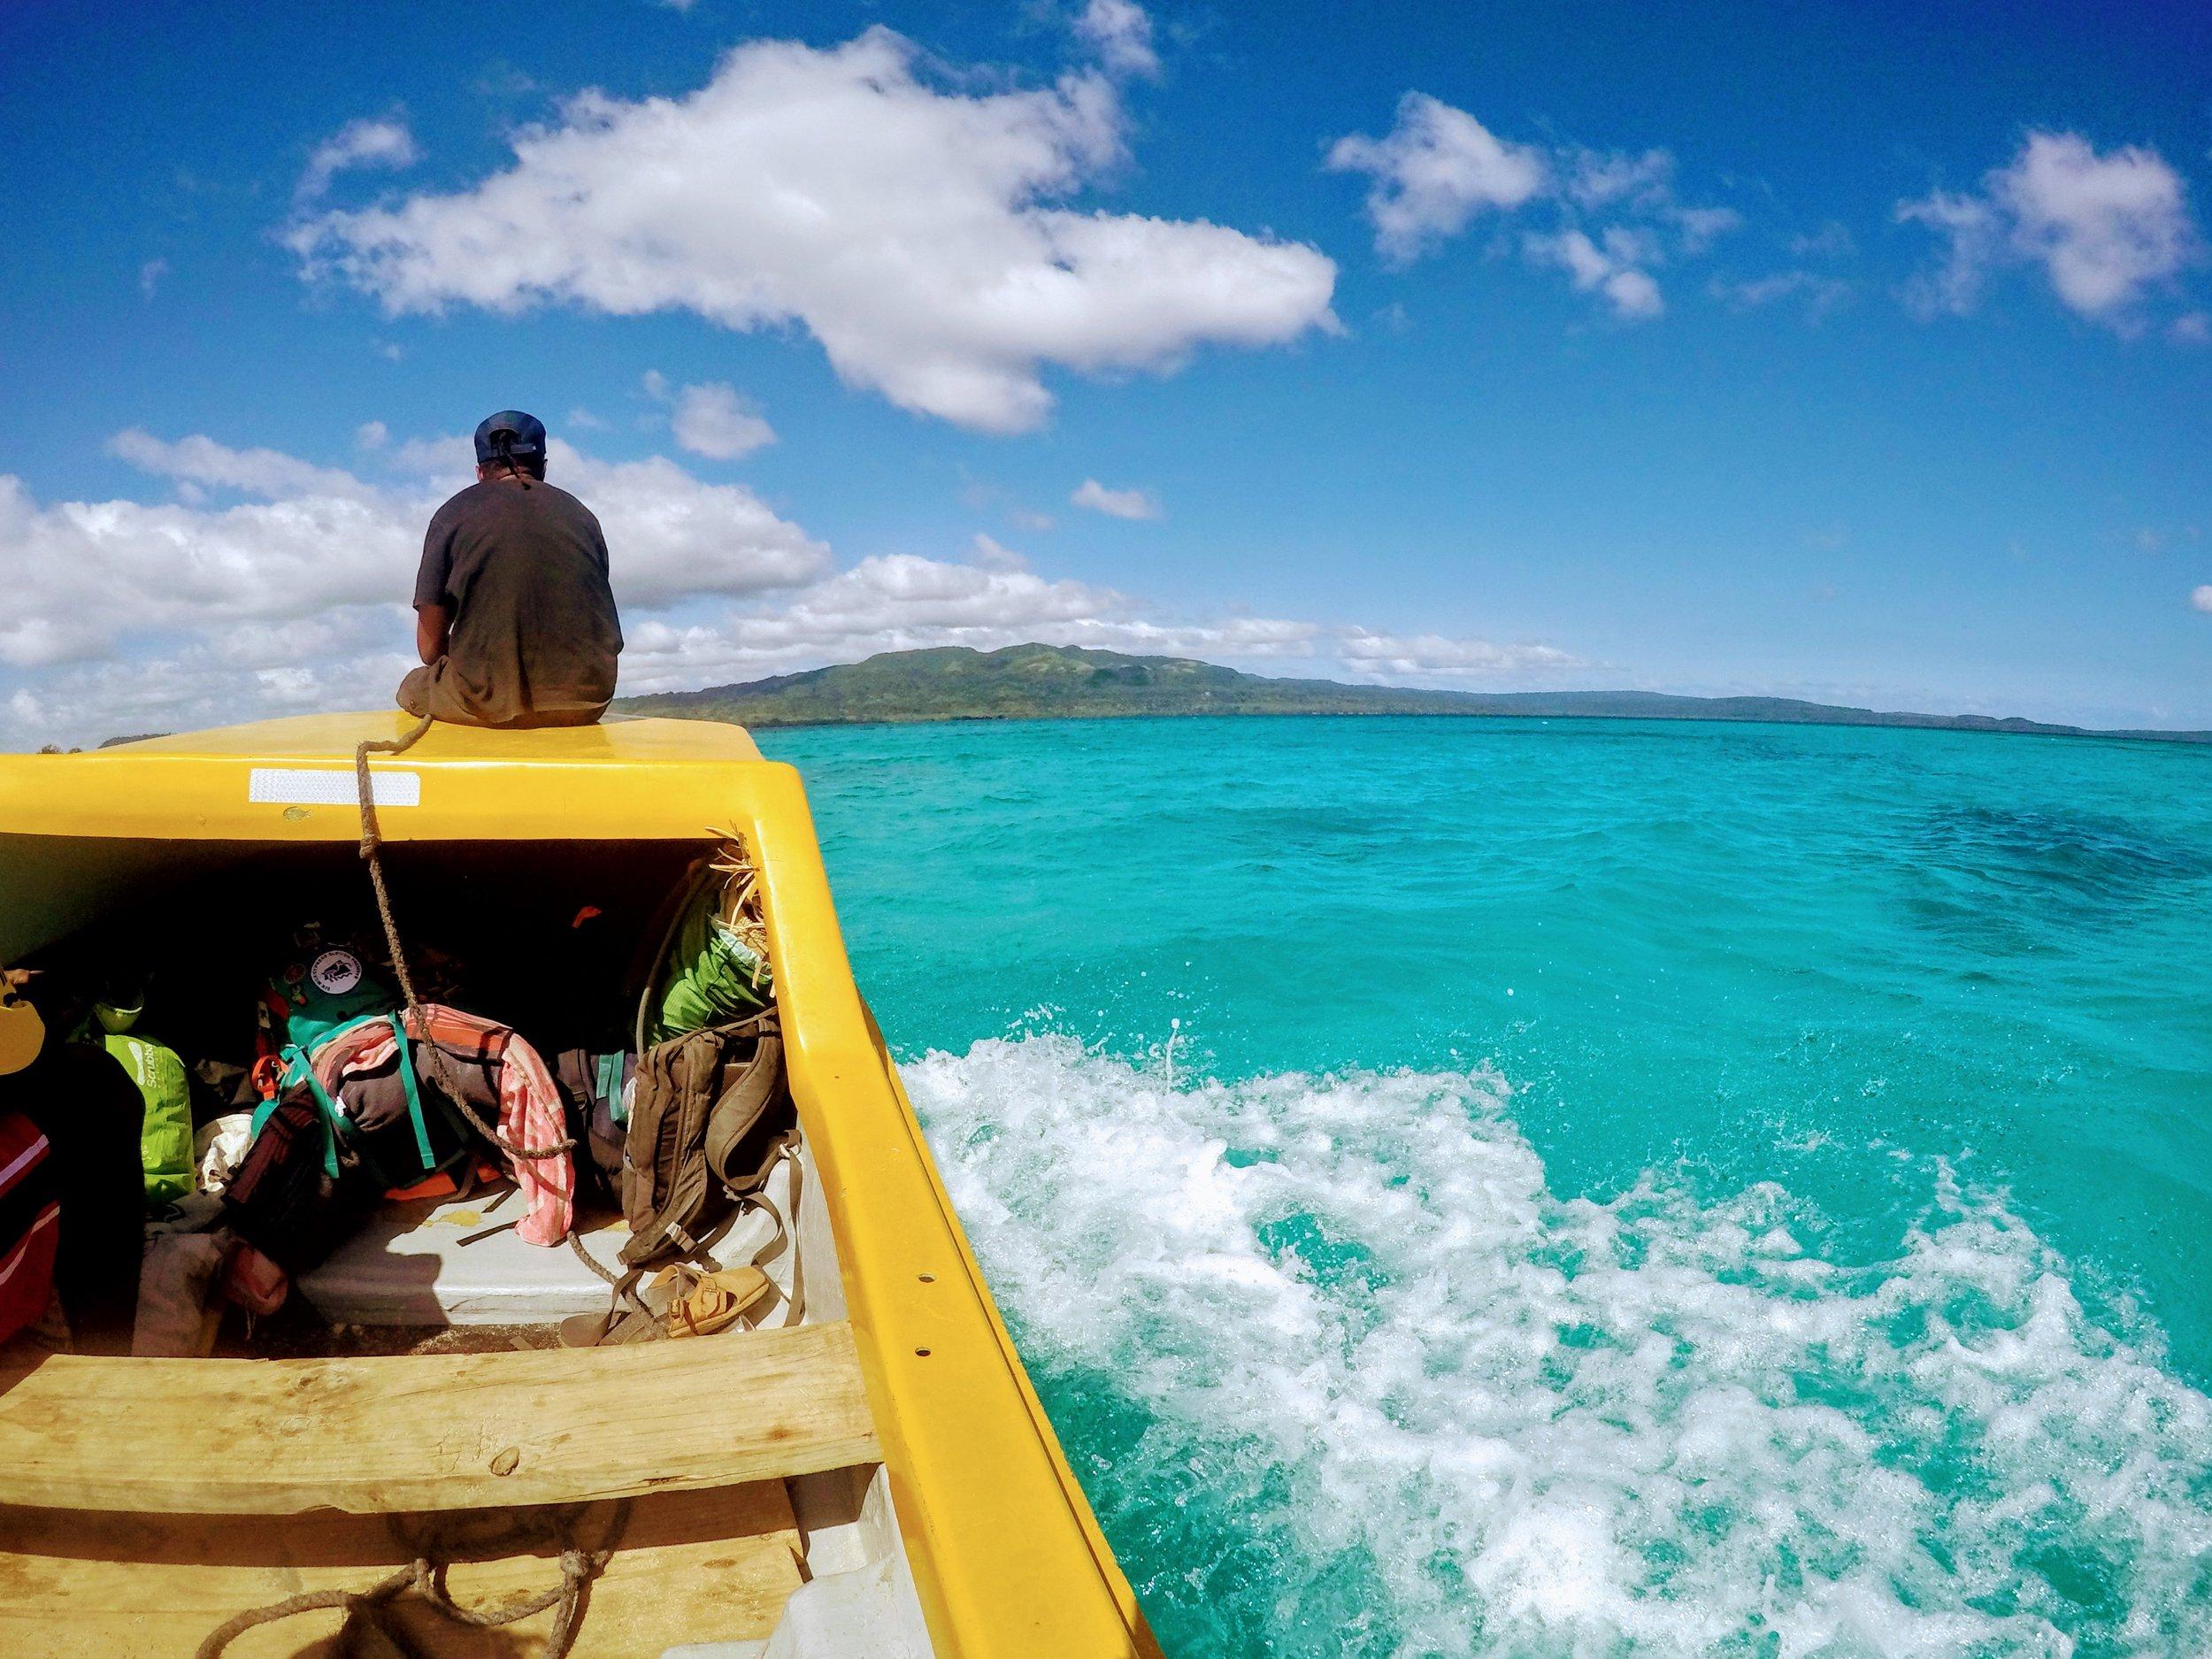 Boating across stunning Undine Bay.